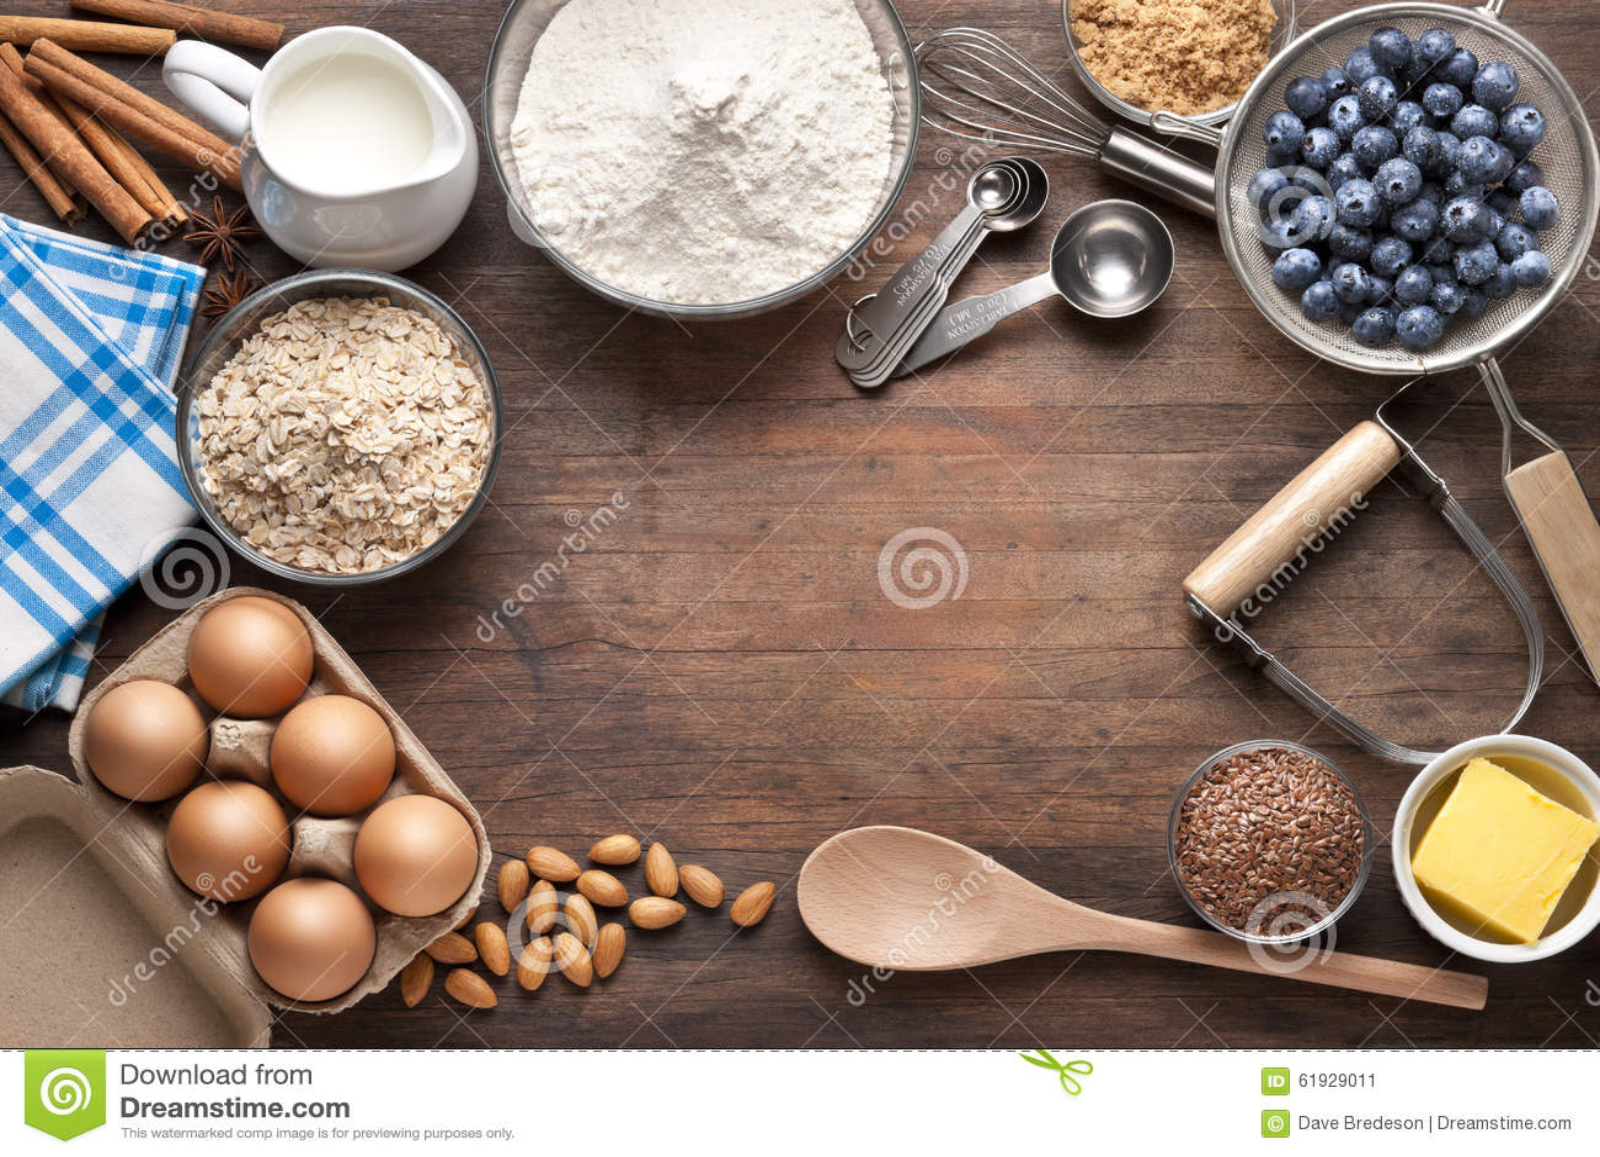 Food Cooking Baking Background Stock Image - Image of ...